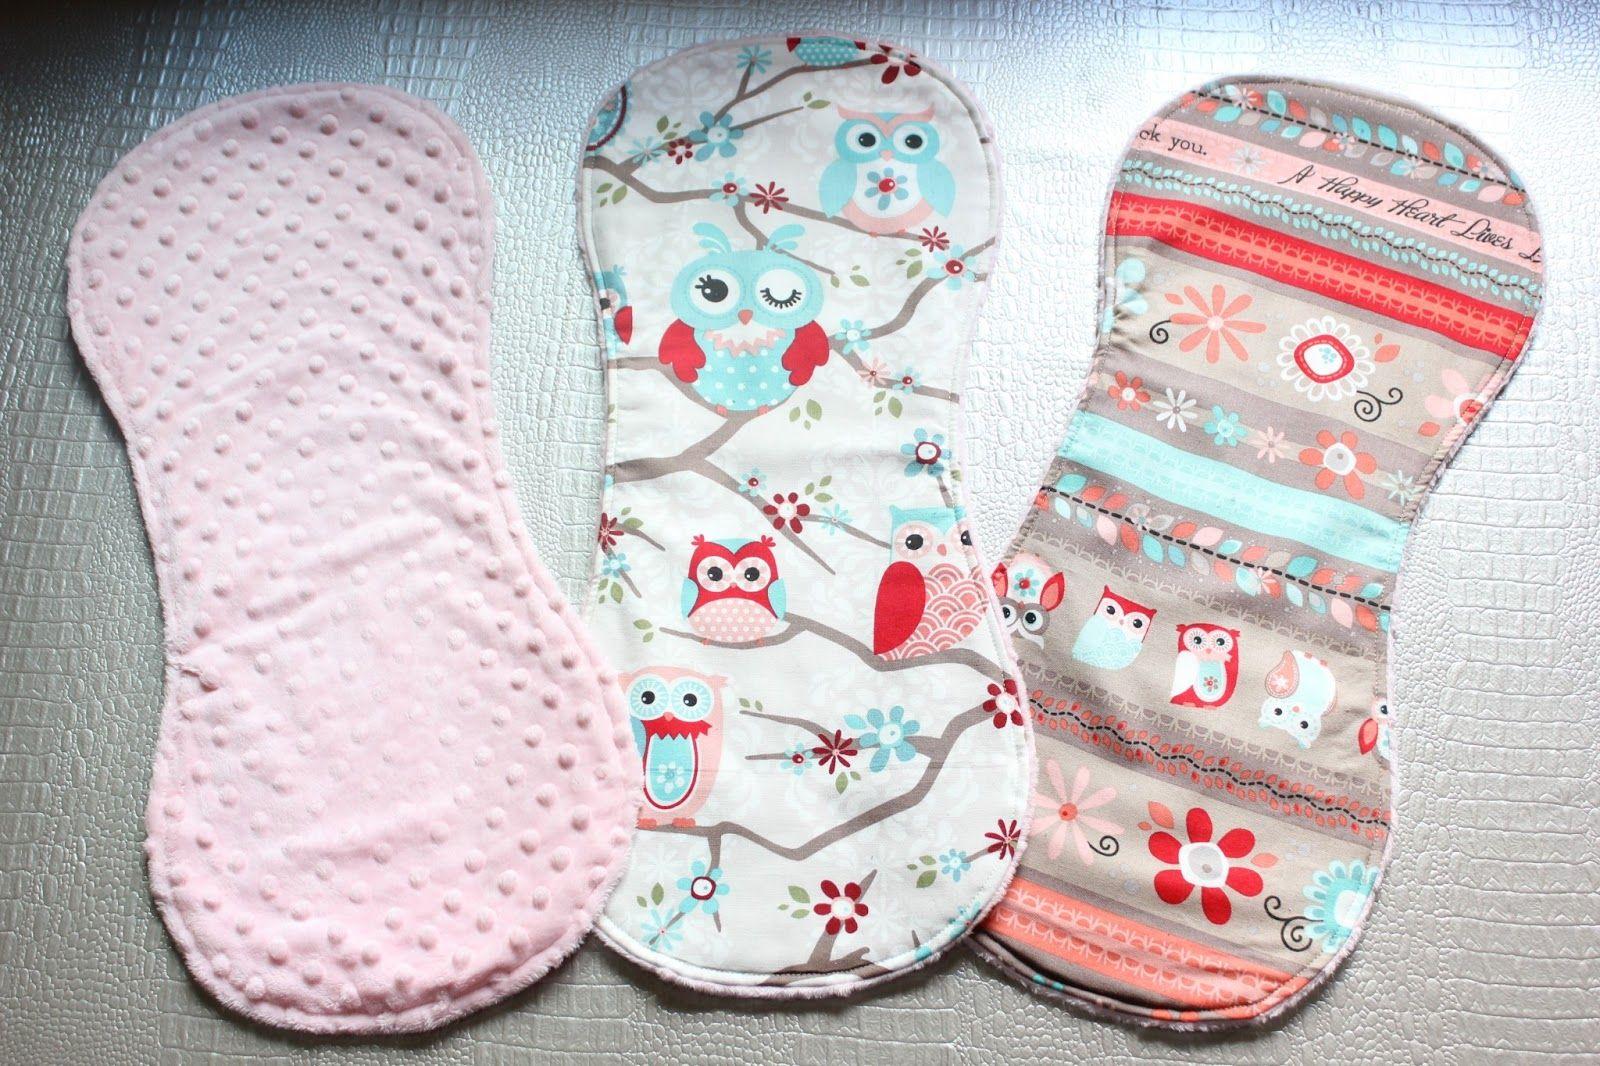 DIY  Cómo hacer toallas de eructar para bebé con tela minky - Handbox Craft  Lovers  a6beb3fa3da